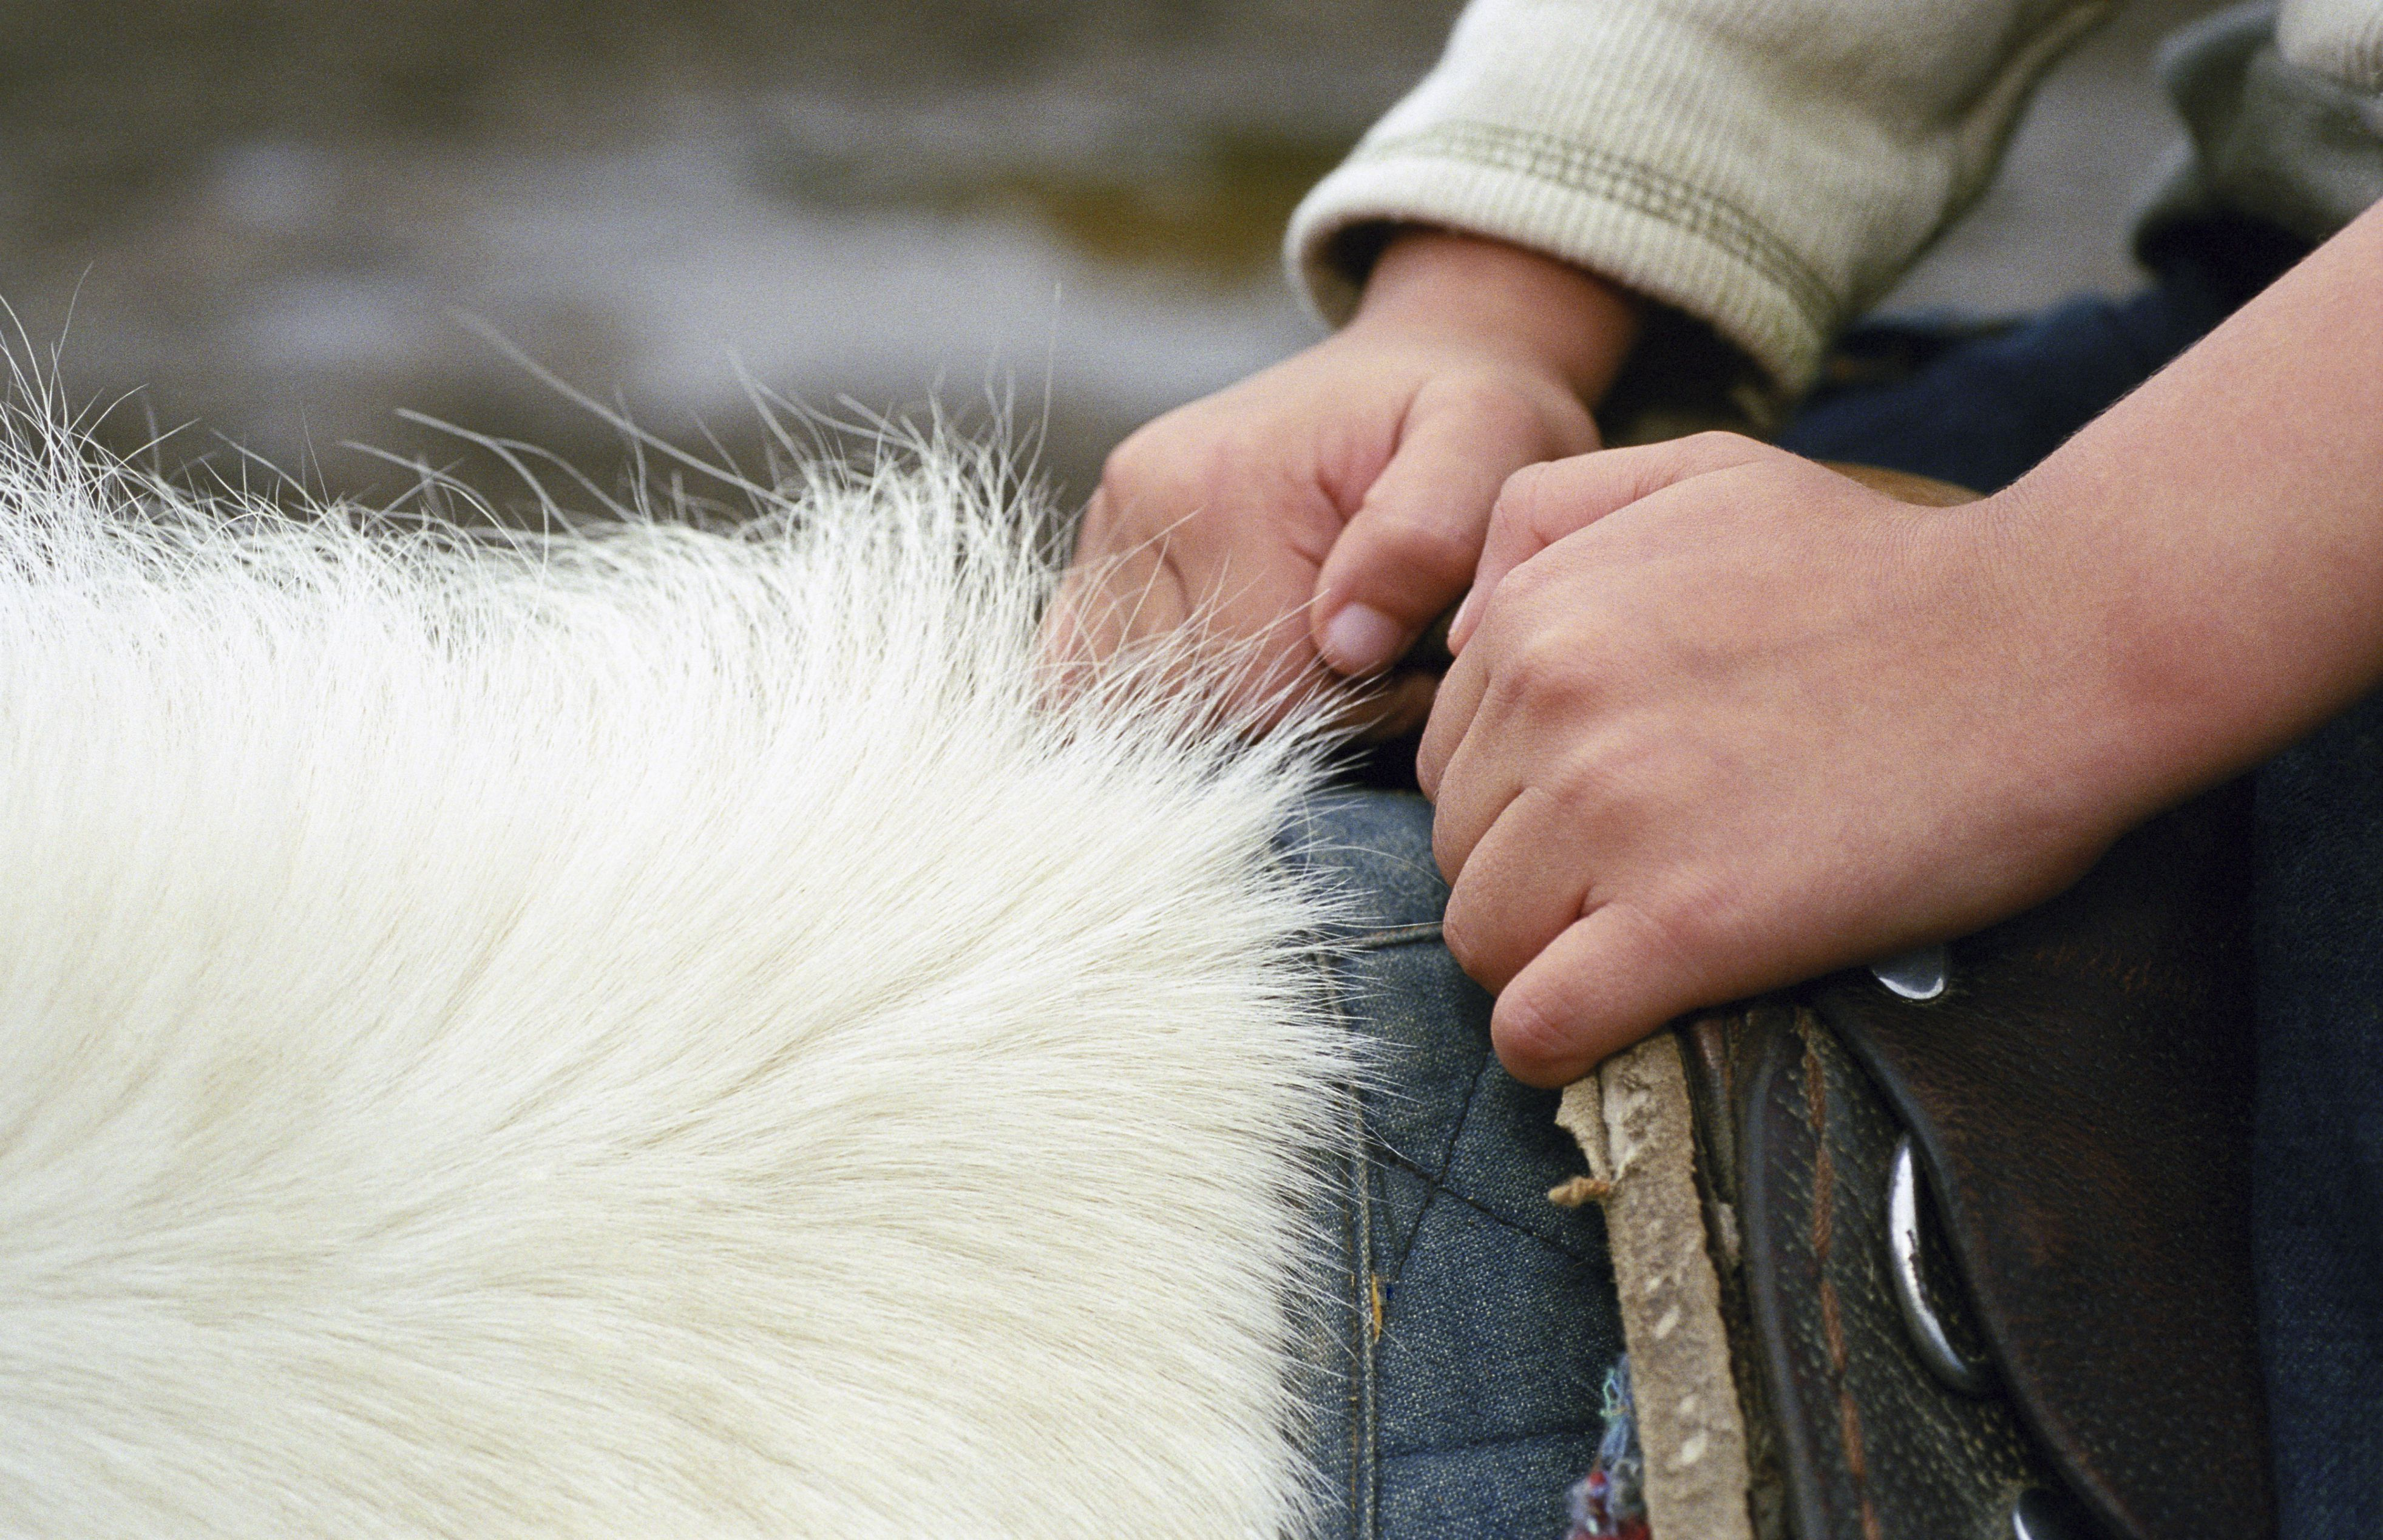 Boy (4-6) holding saddle on horse, close-up of hands